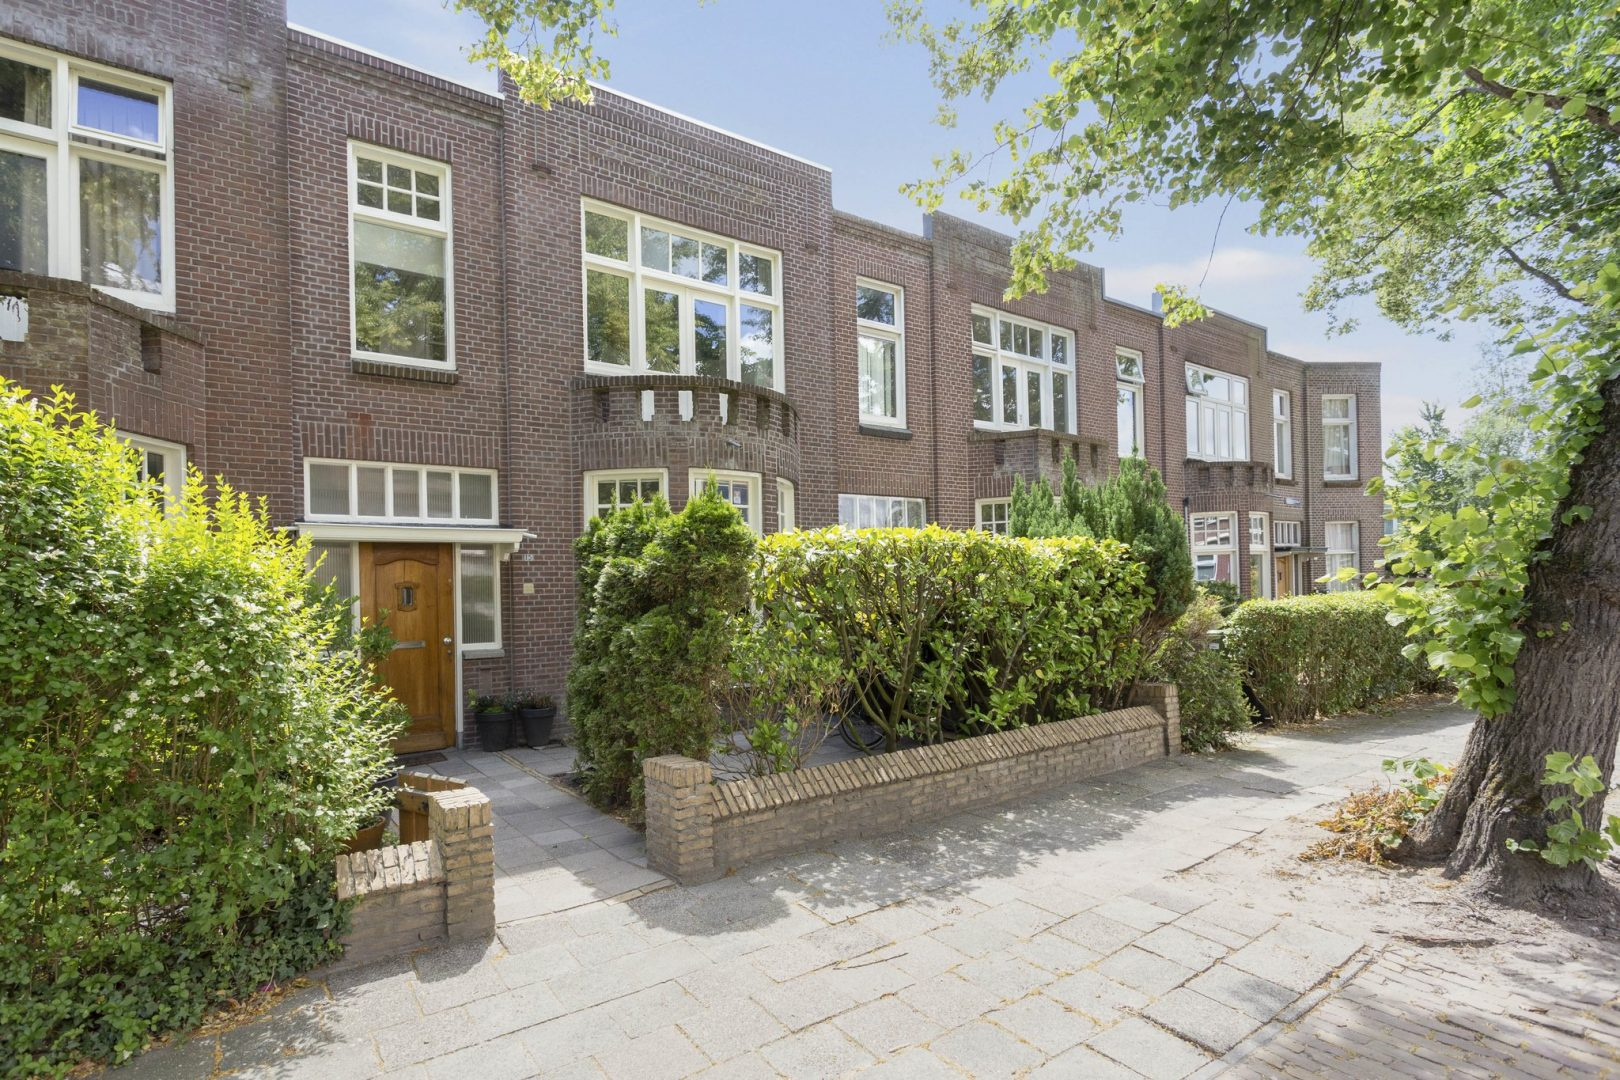 Leeuwarden – Leeuwerikstraat 15